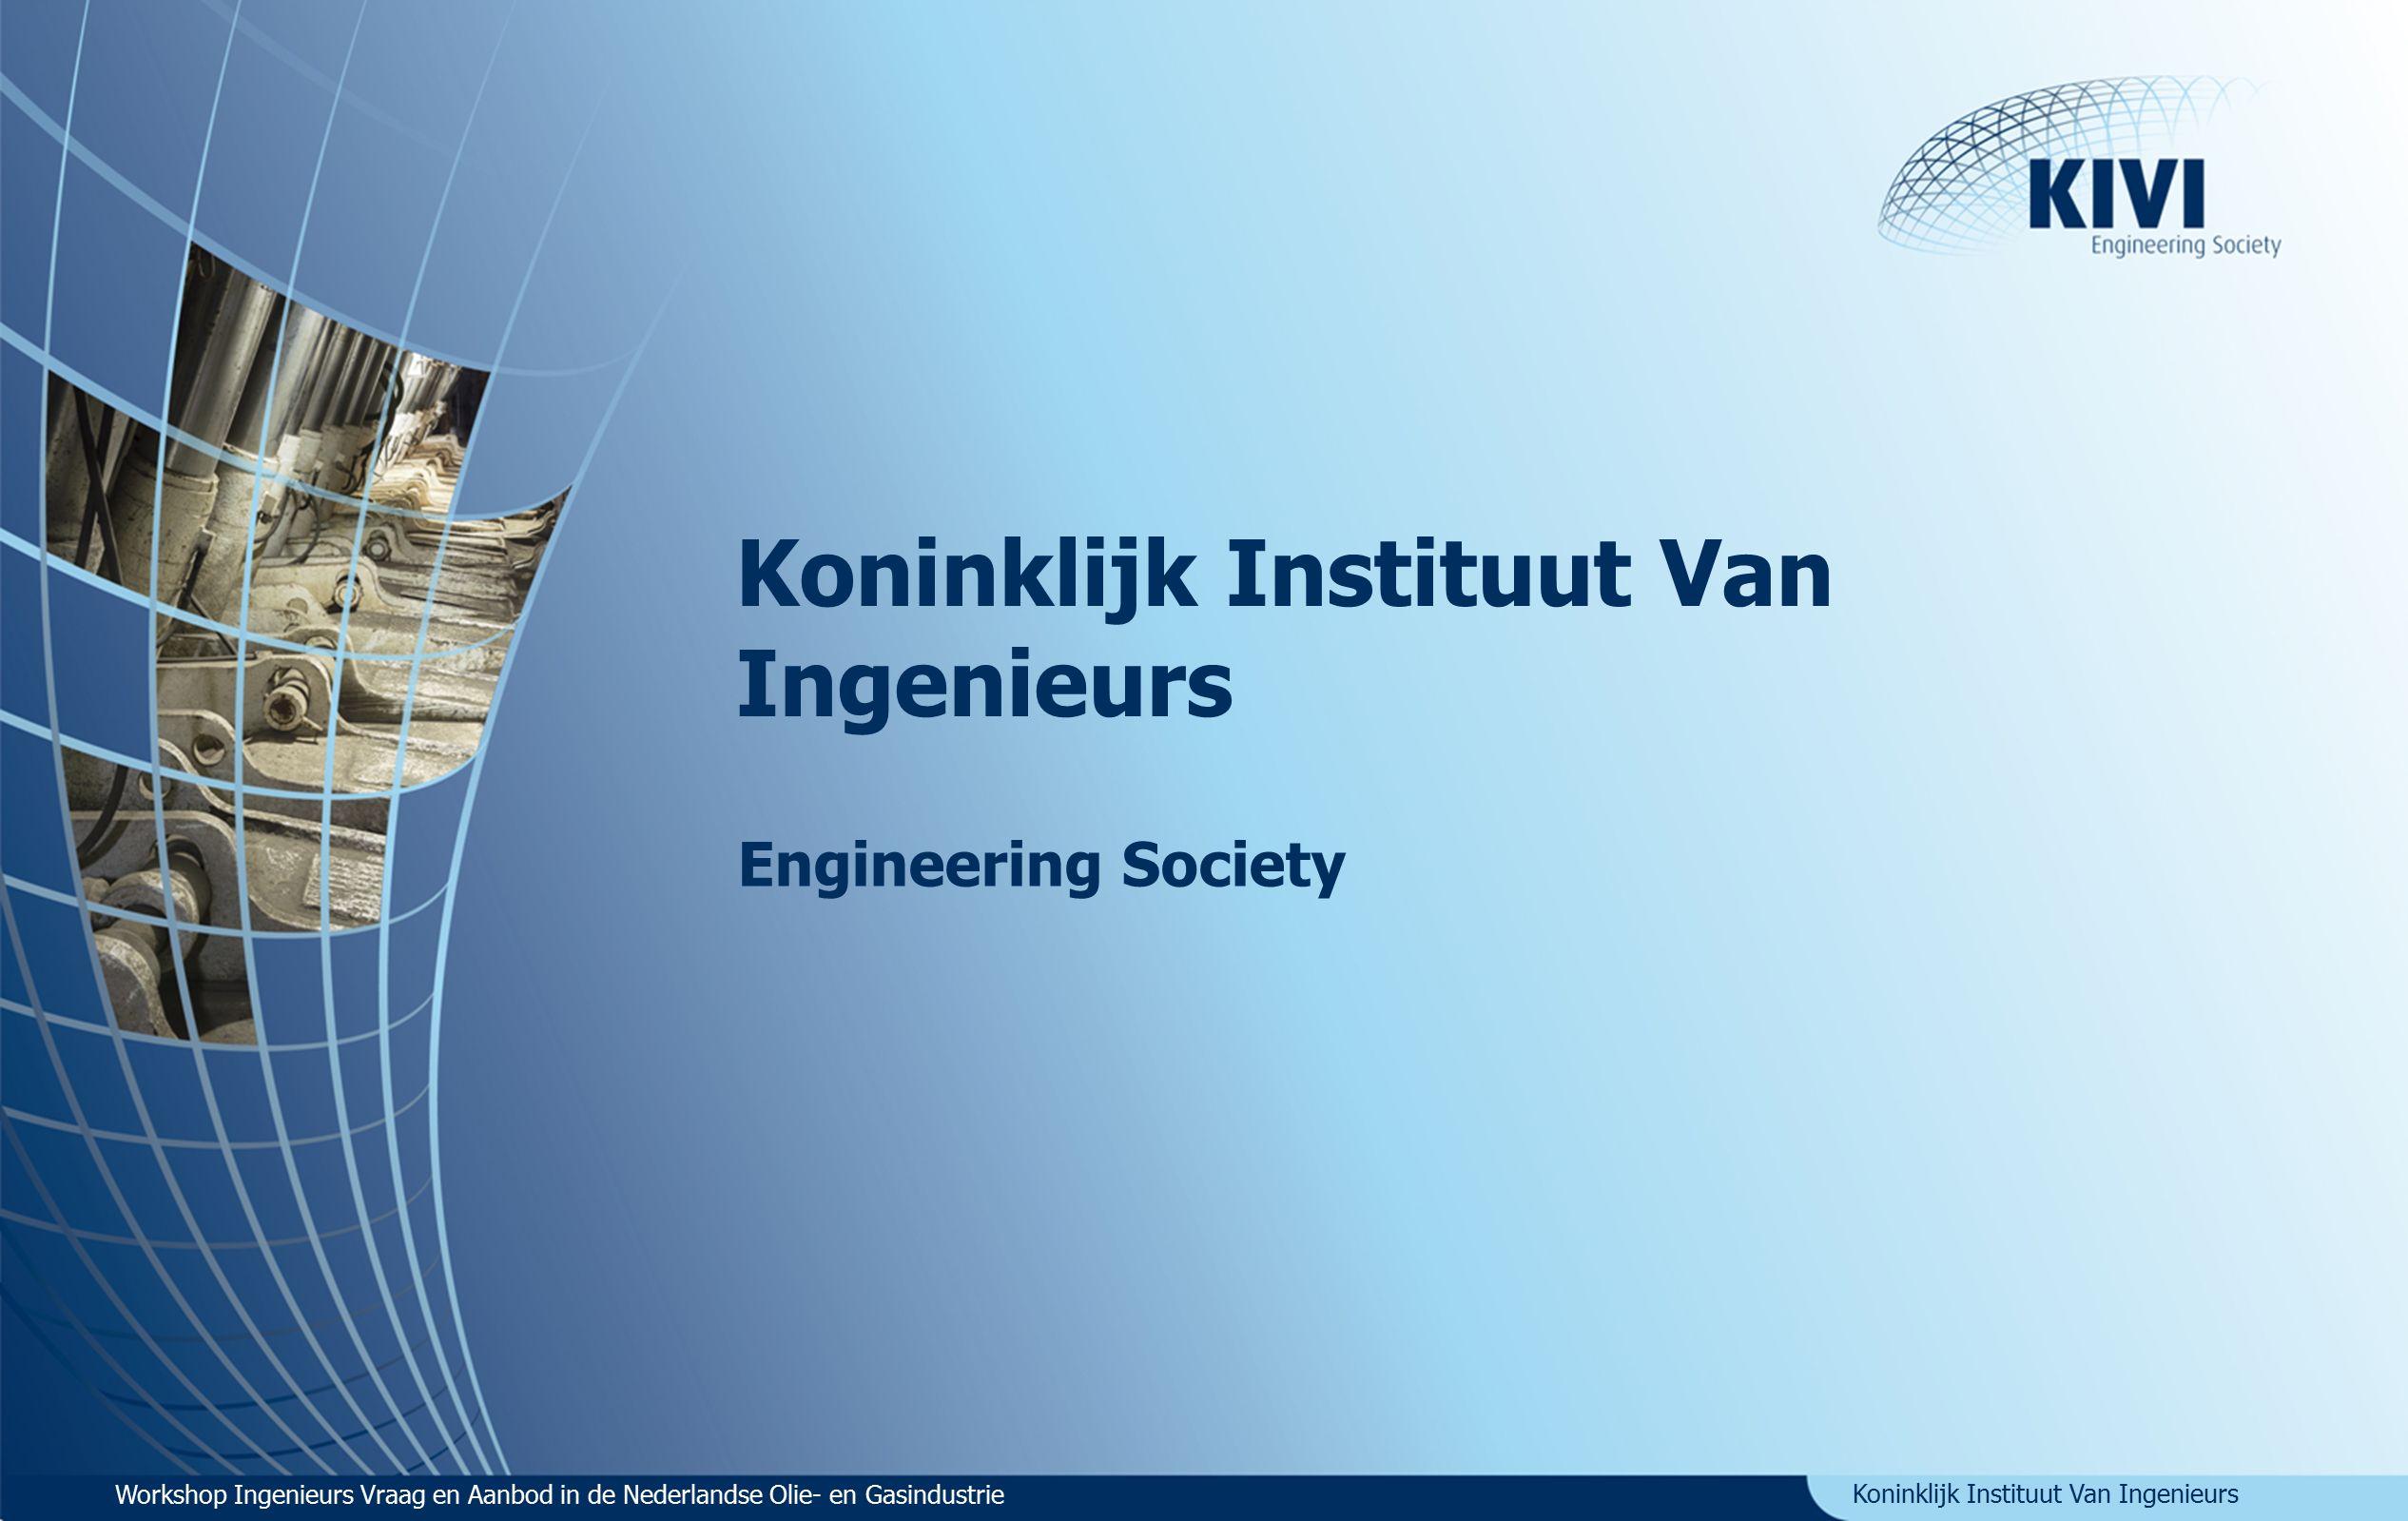 Koninklijk Instituut Van Ingenieurs Workshop Ingenieurs Vraag en Aanbod in de Nederlandse Olie- en Gasindustrie KIVI afdeling Olie- en Gas technologie 9 september 2015 Workshop Ingenieurs Vraag en Aanbod in de Nederlandse Olie- en Gasindustrie